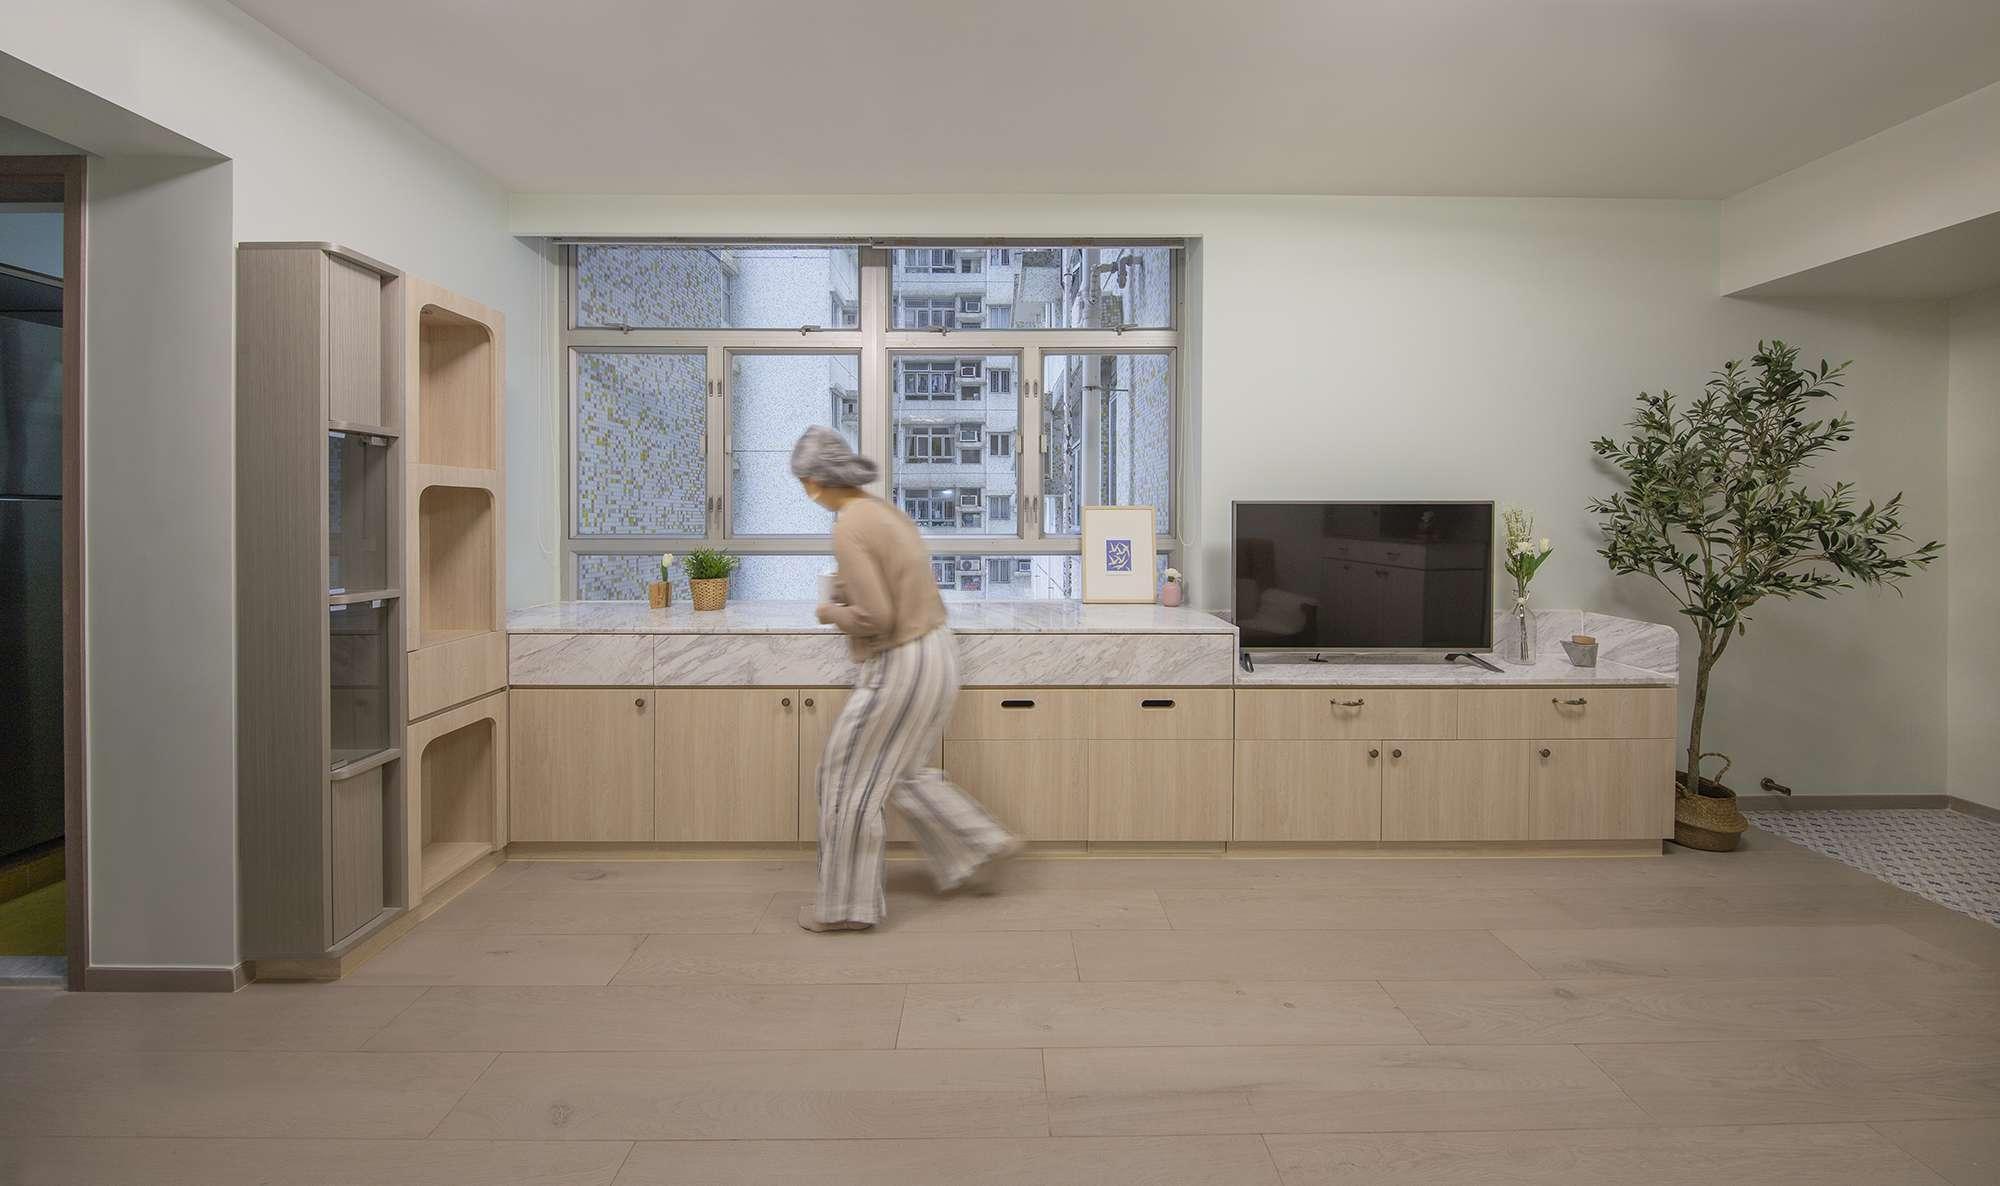 Floral Aged House apartment renovation by Sim-Plex Design Studio counter